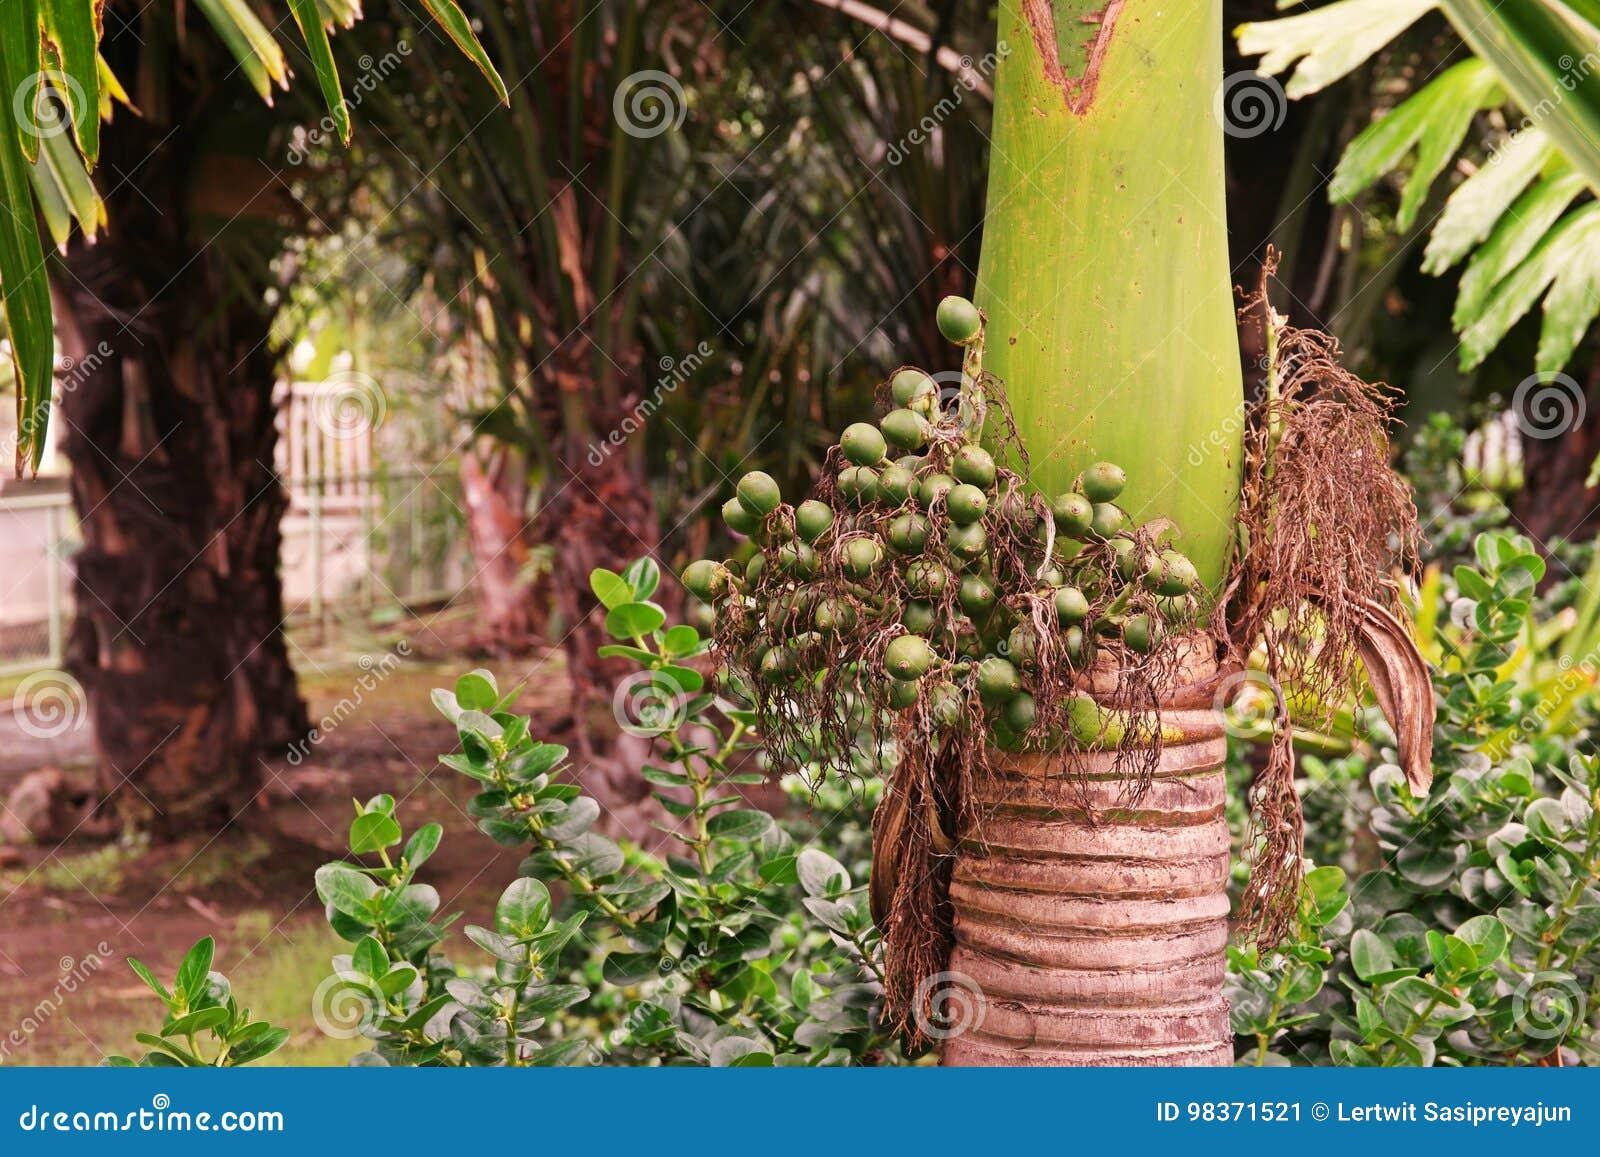 Betel nut, dwarf variety stock image. Image of betel - 98371521